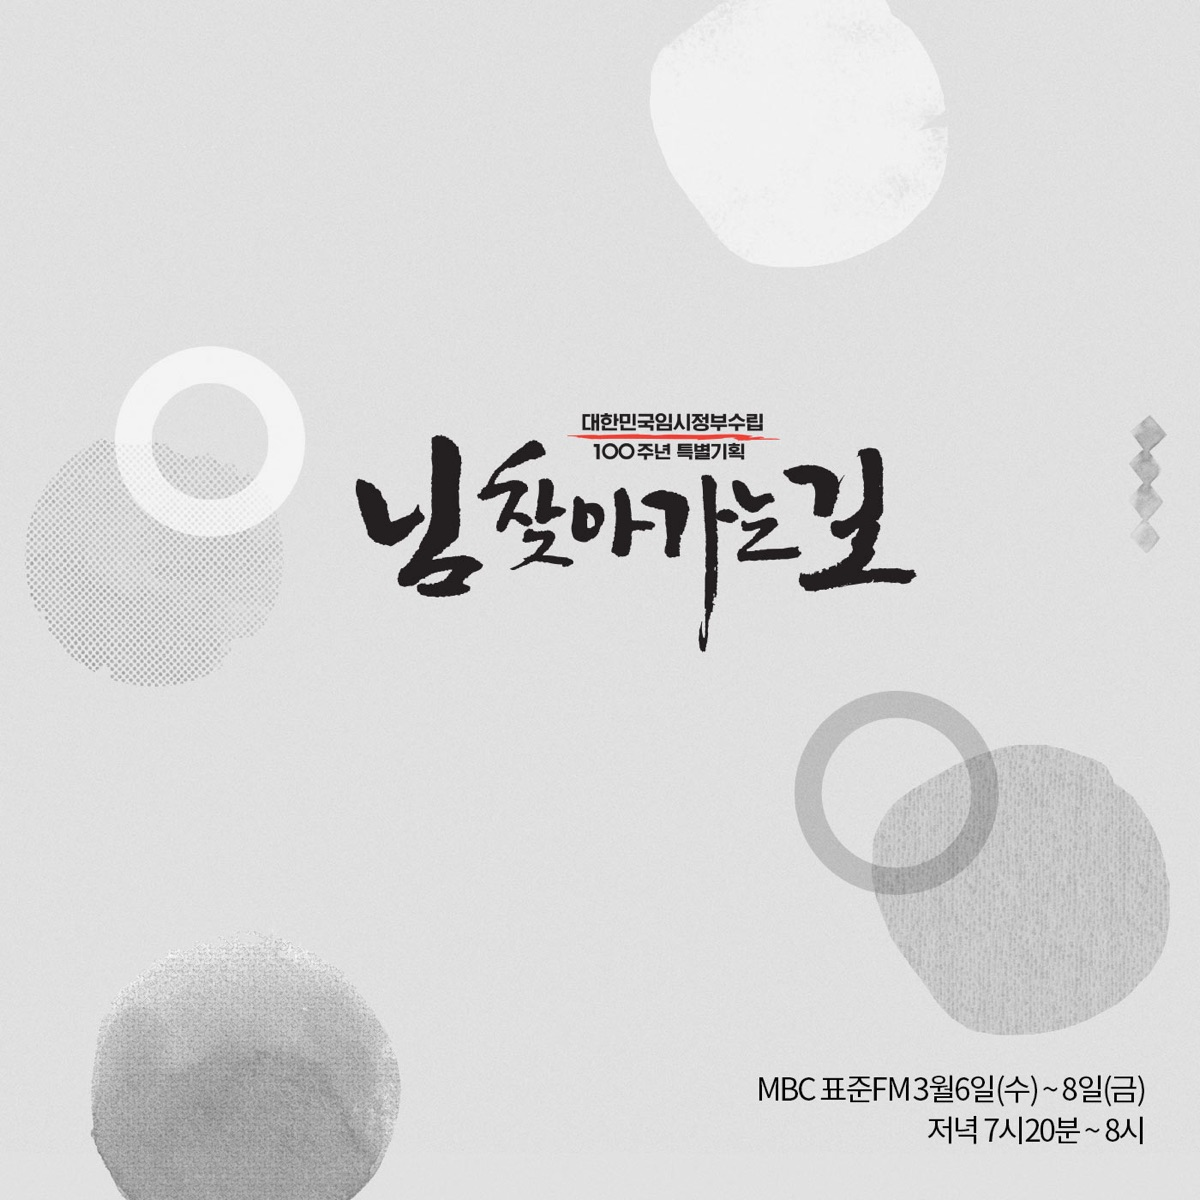 MBC 라디오 대한민국 임시정부수립 100주년 특별기획 님 찾아가는 길